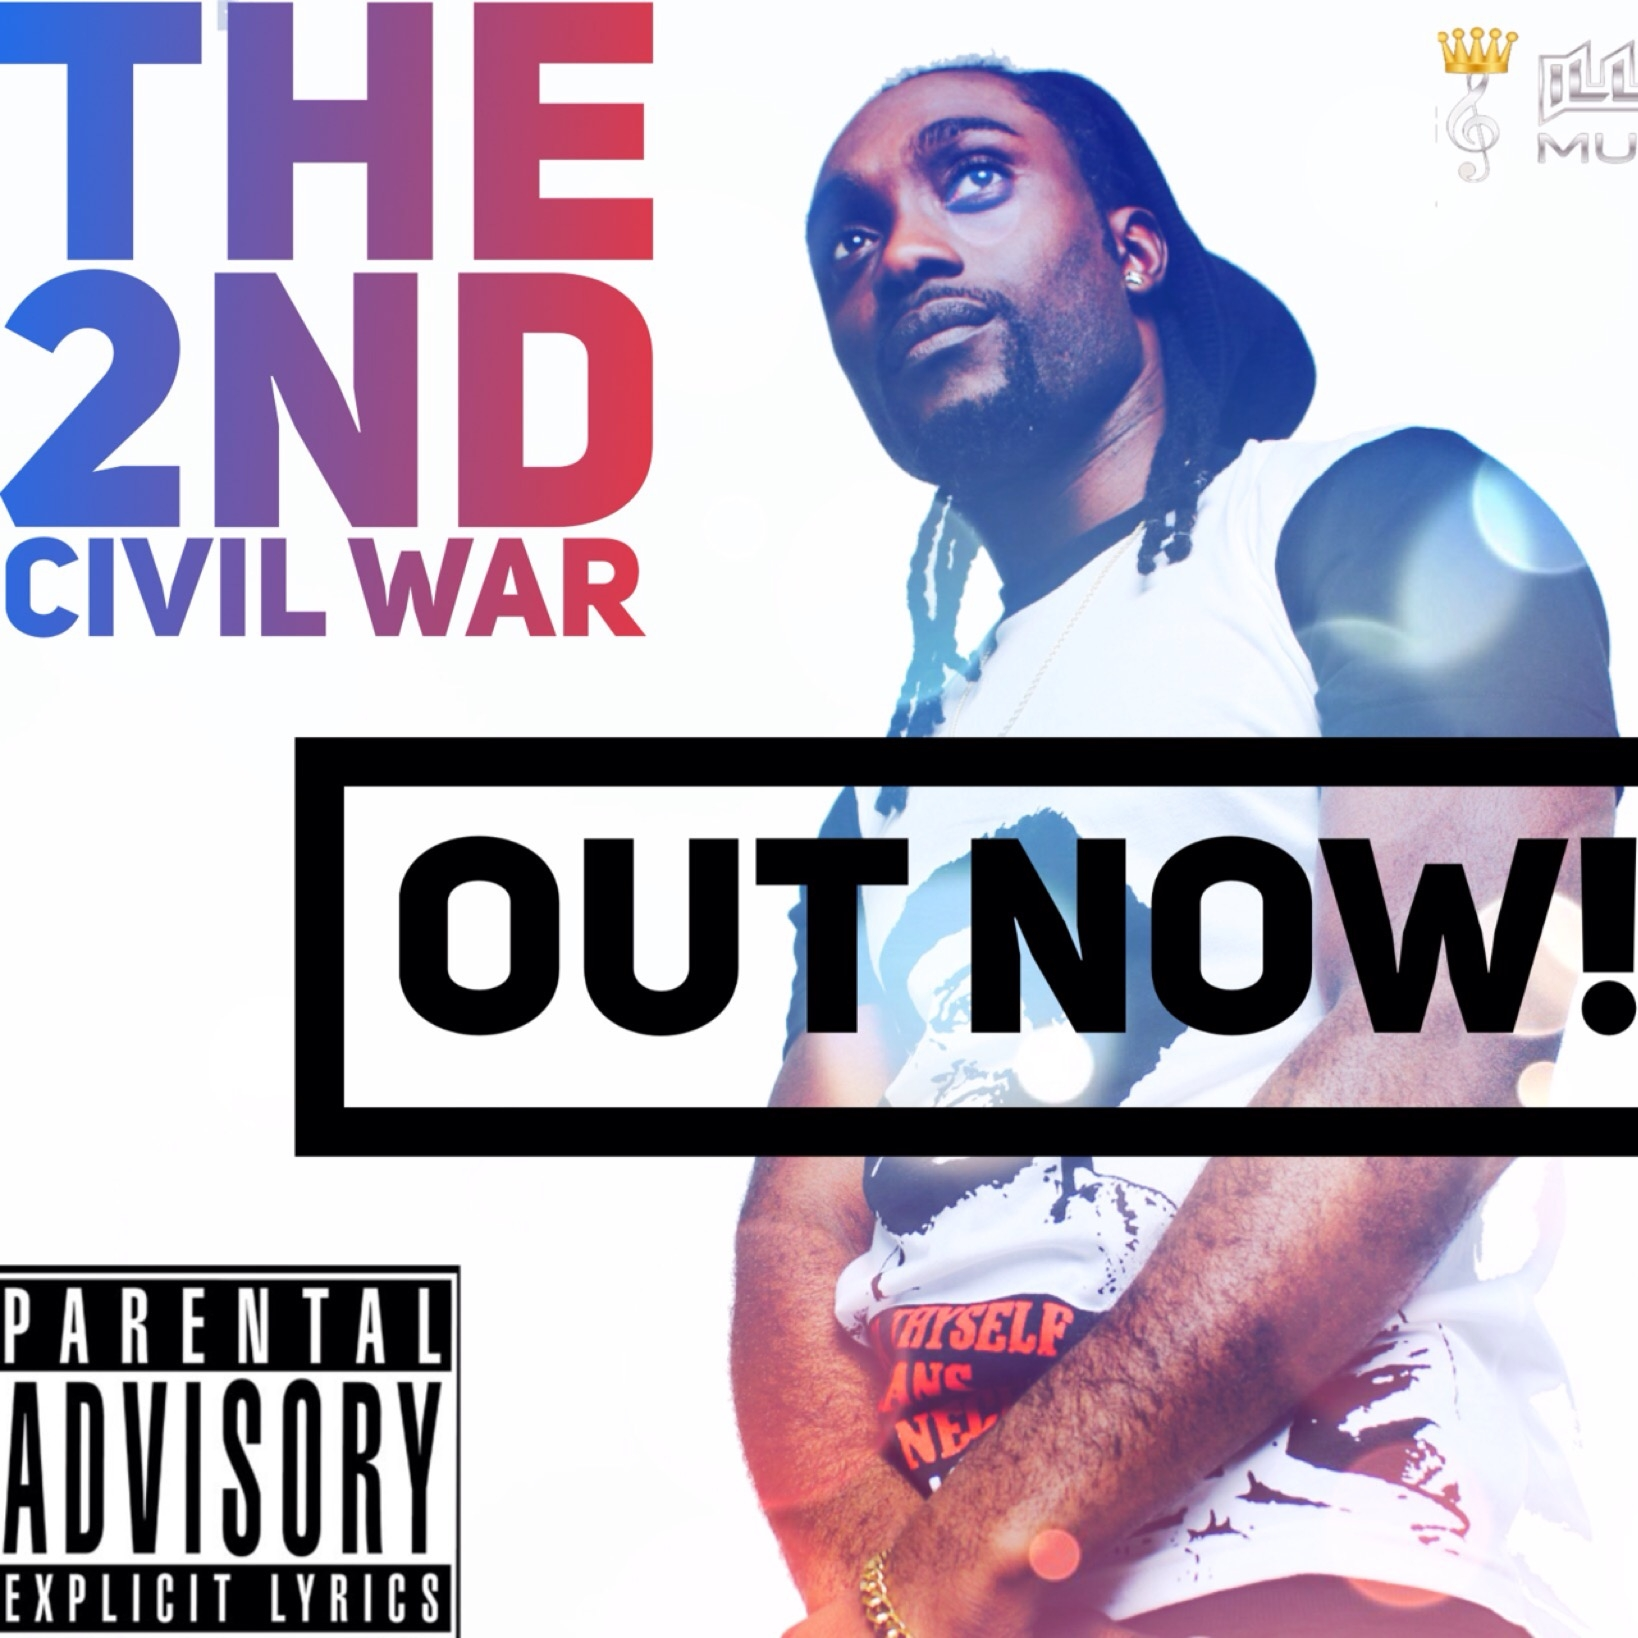 THE 2ND CIVIL WAR